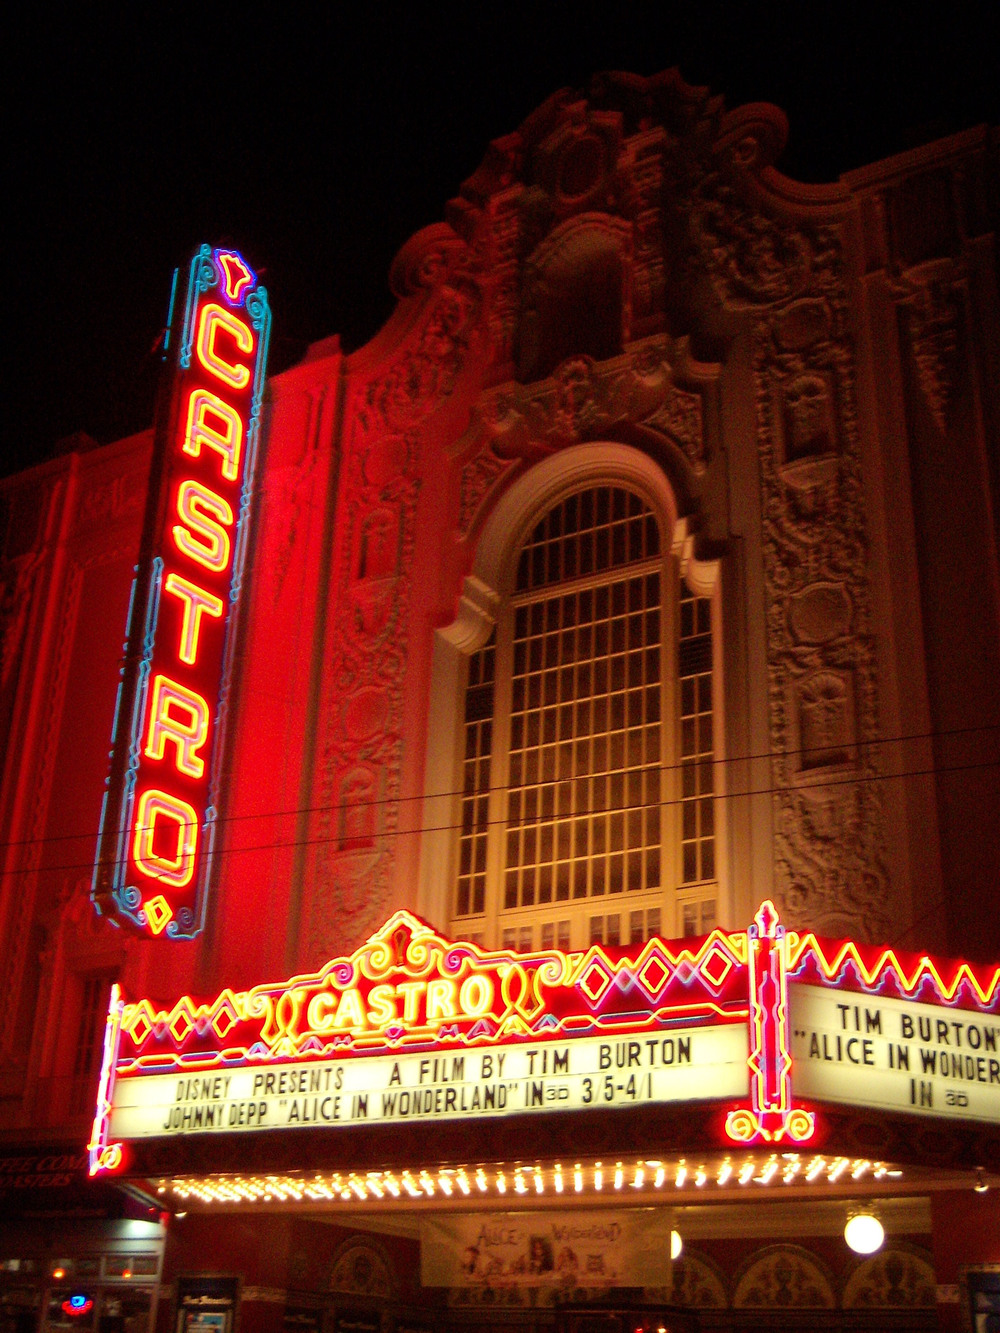 castro-facade-with-neon.jpg